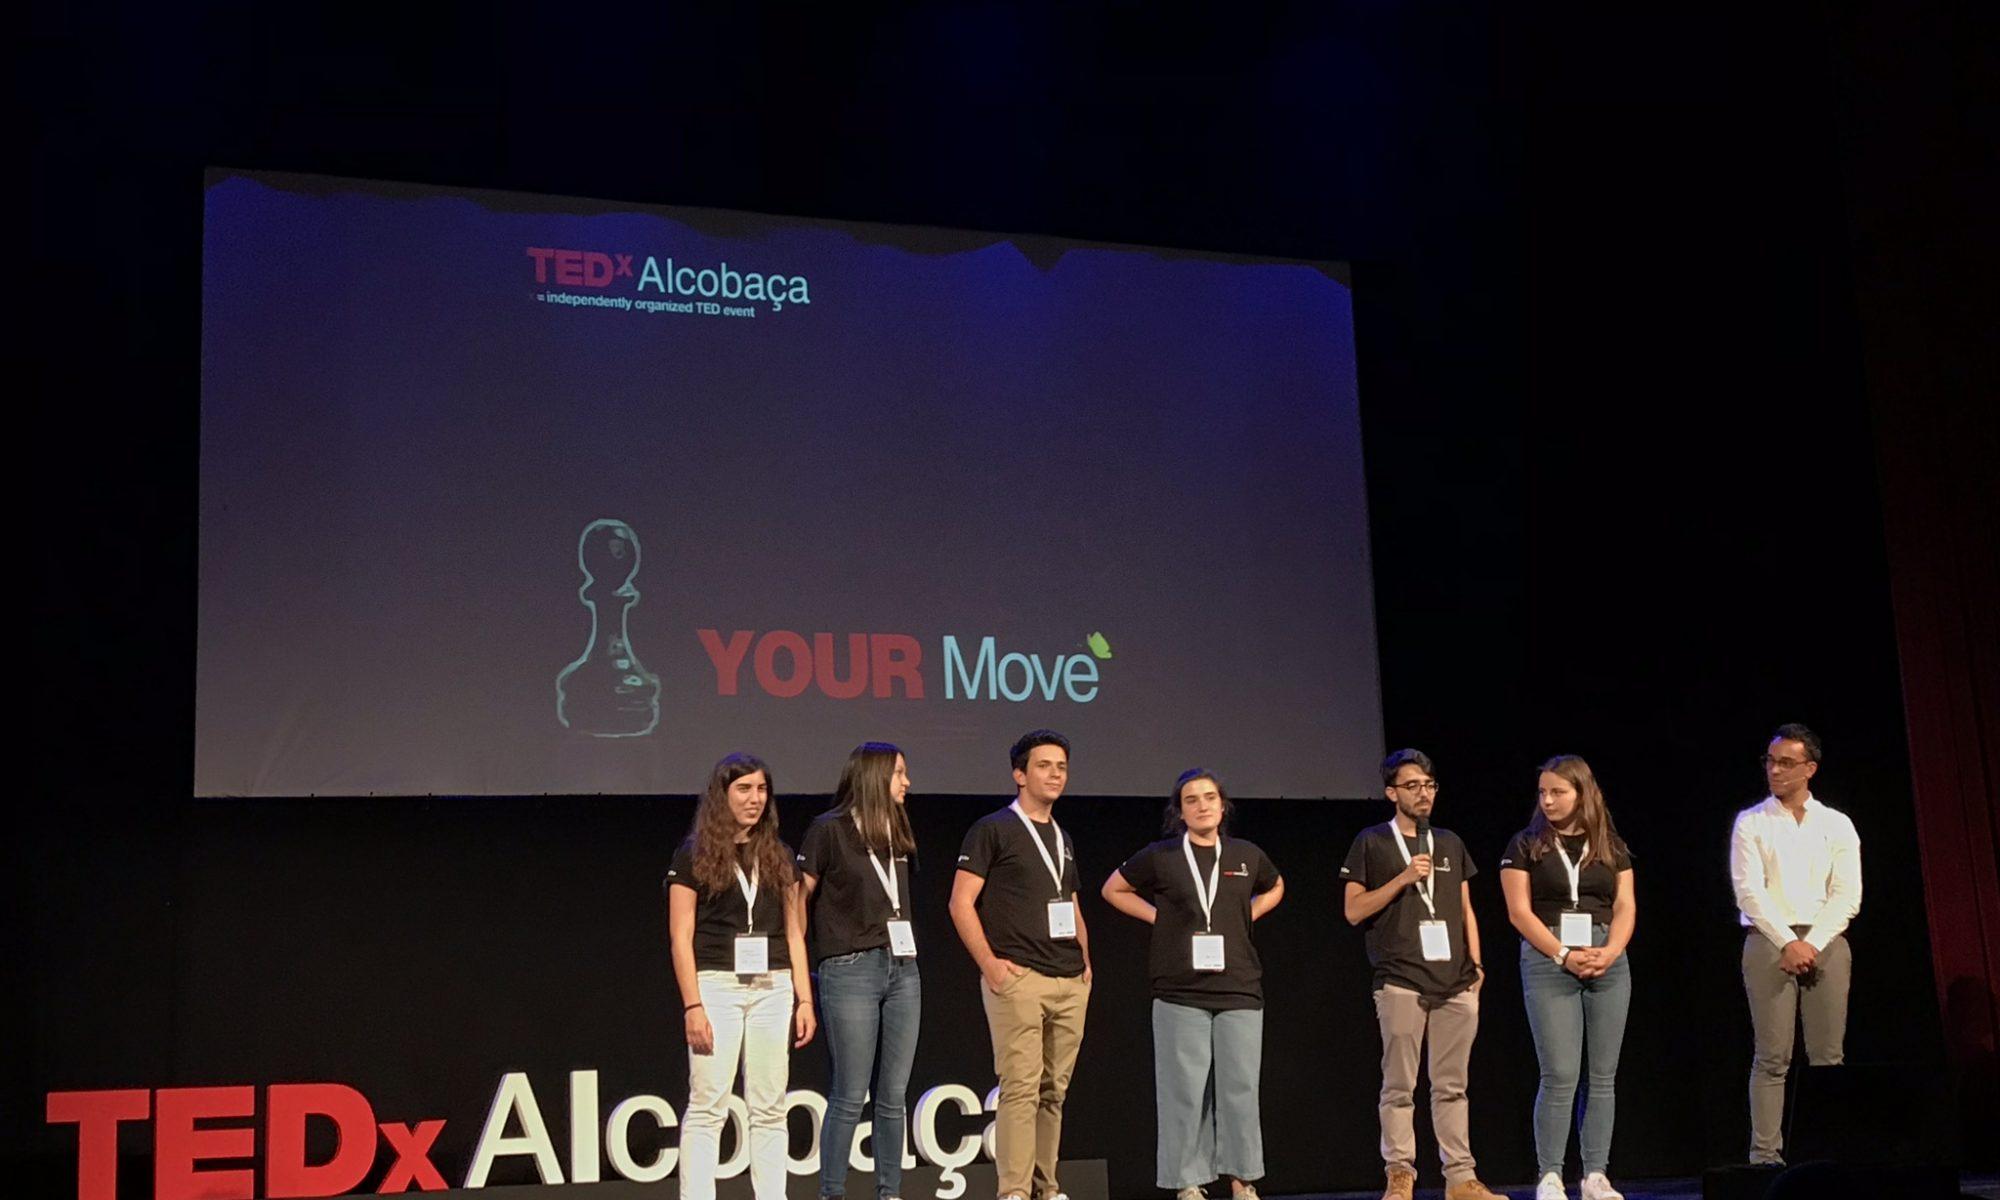 tedx-alcobaça-til-magazine-your-move